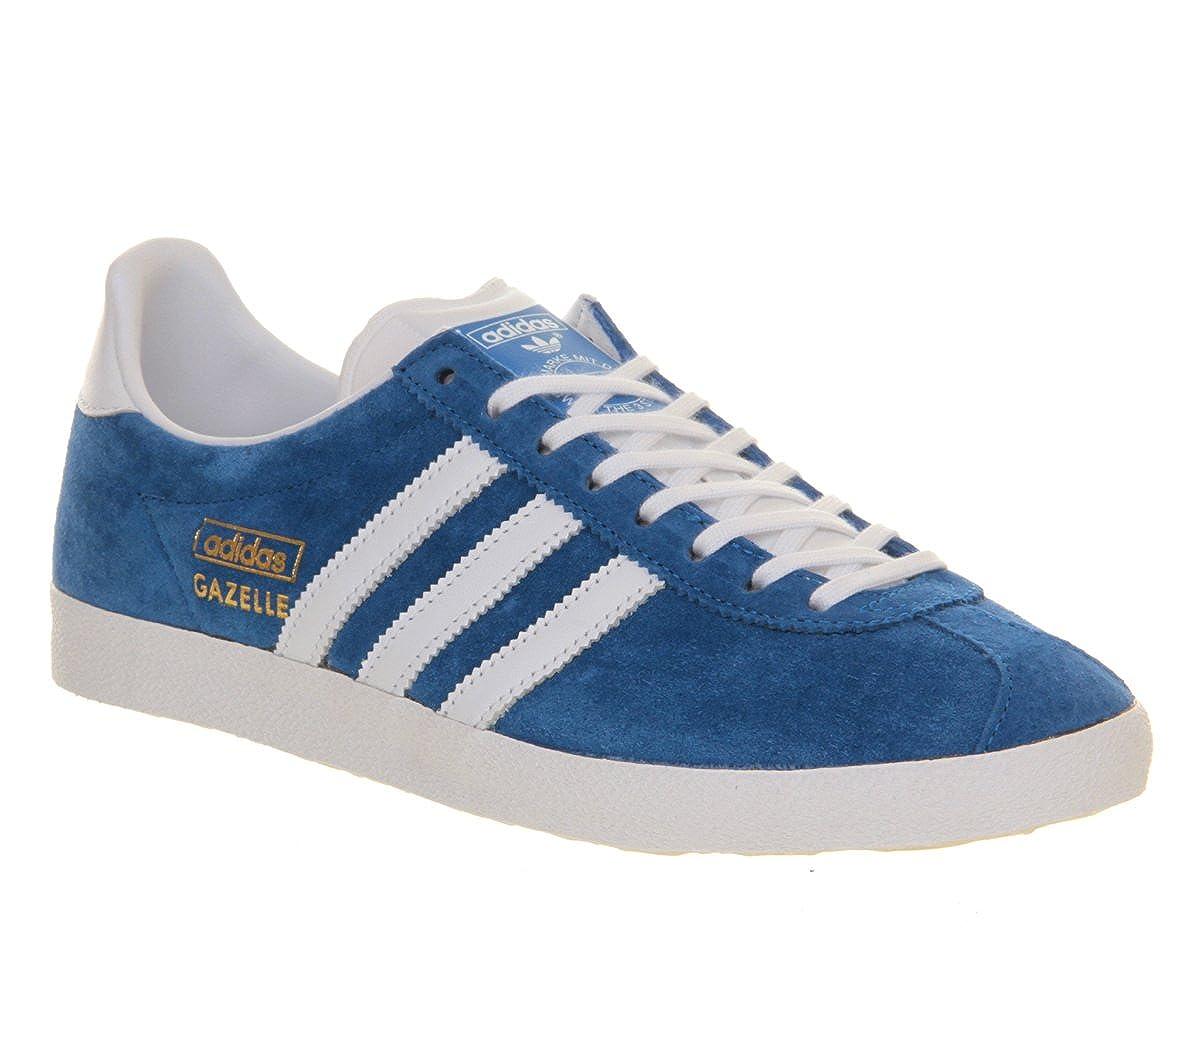 hot sale online f0ba6 4bf28 Adidas Gazelle Og Air Force Blue White Amazon.co.uk Shoes  B